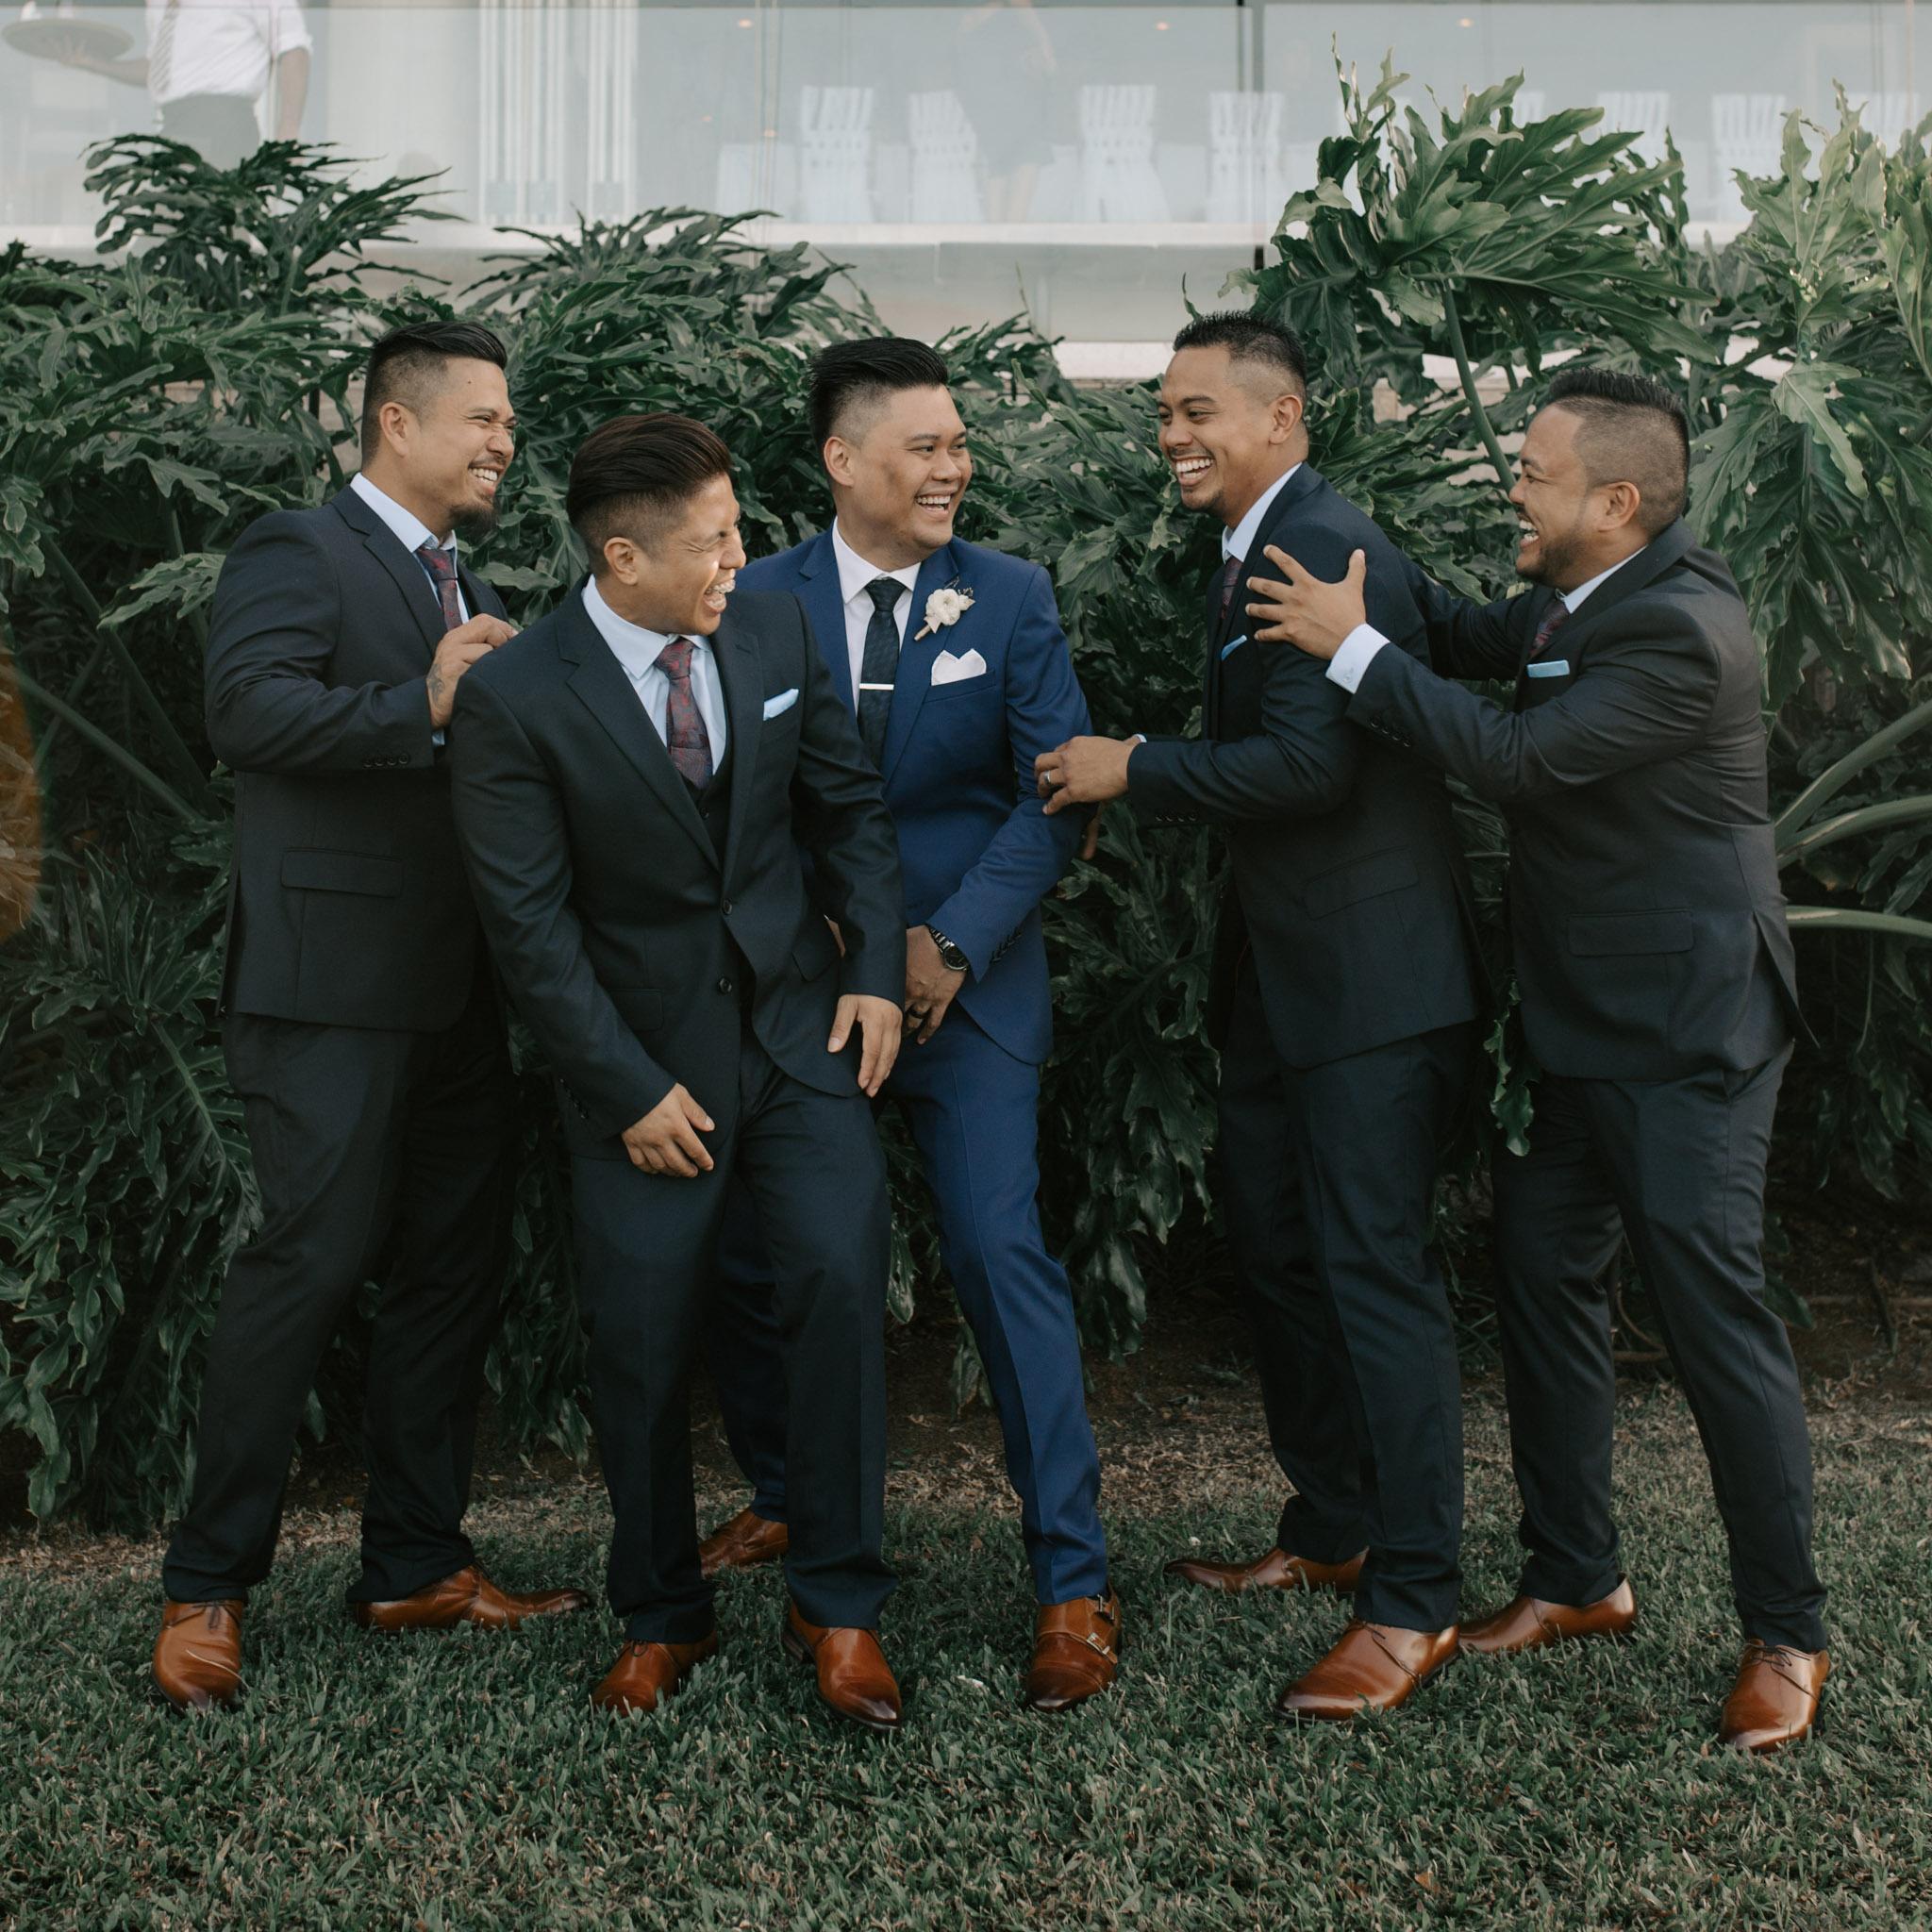 Groomsmen candid photo   Merriman's Kapalua Maui wedding by Hawaii wedding photographer Desiree Leilani